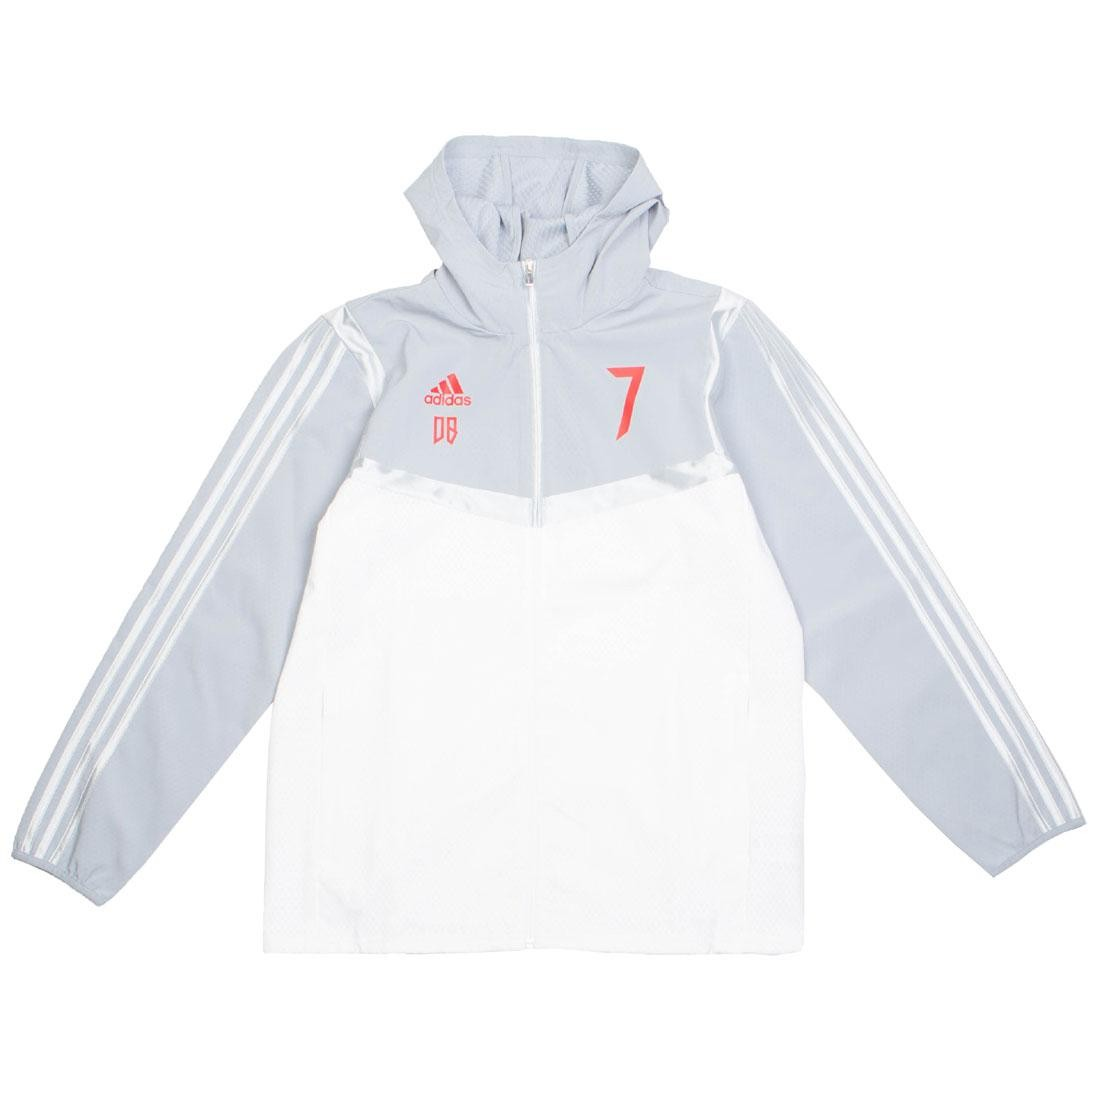 Predator David Beckham Hooded Jacket White Mens | Products